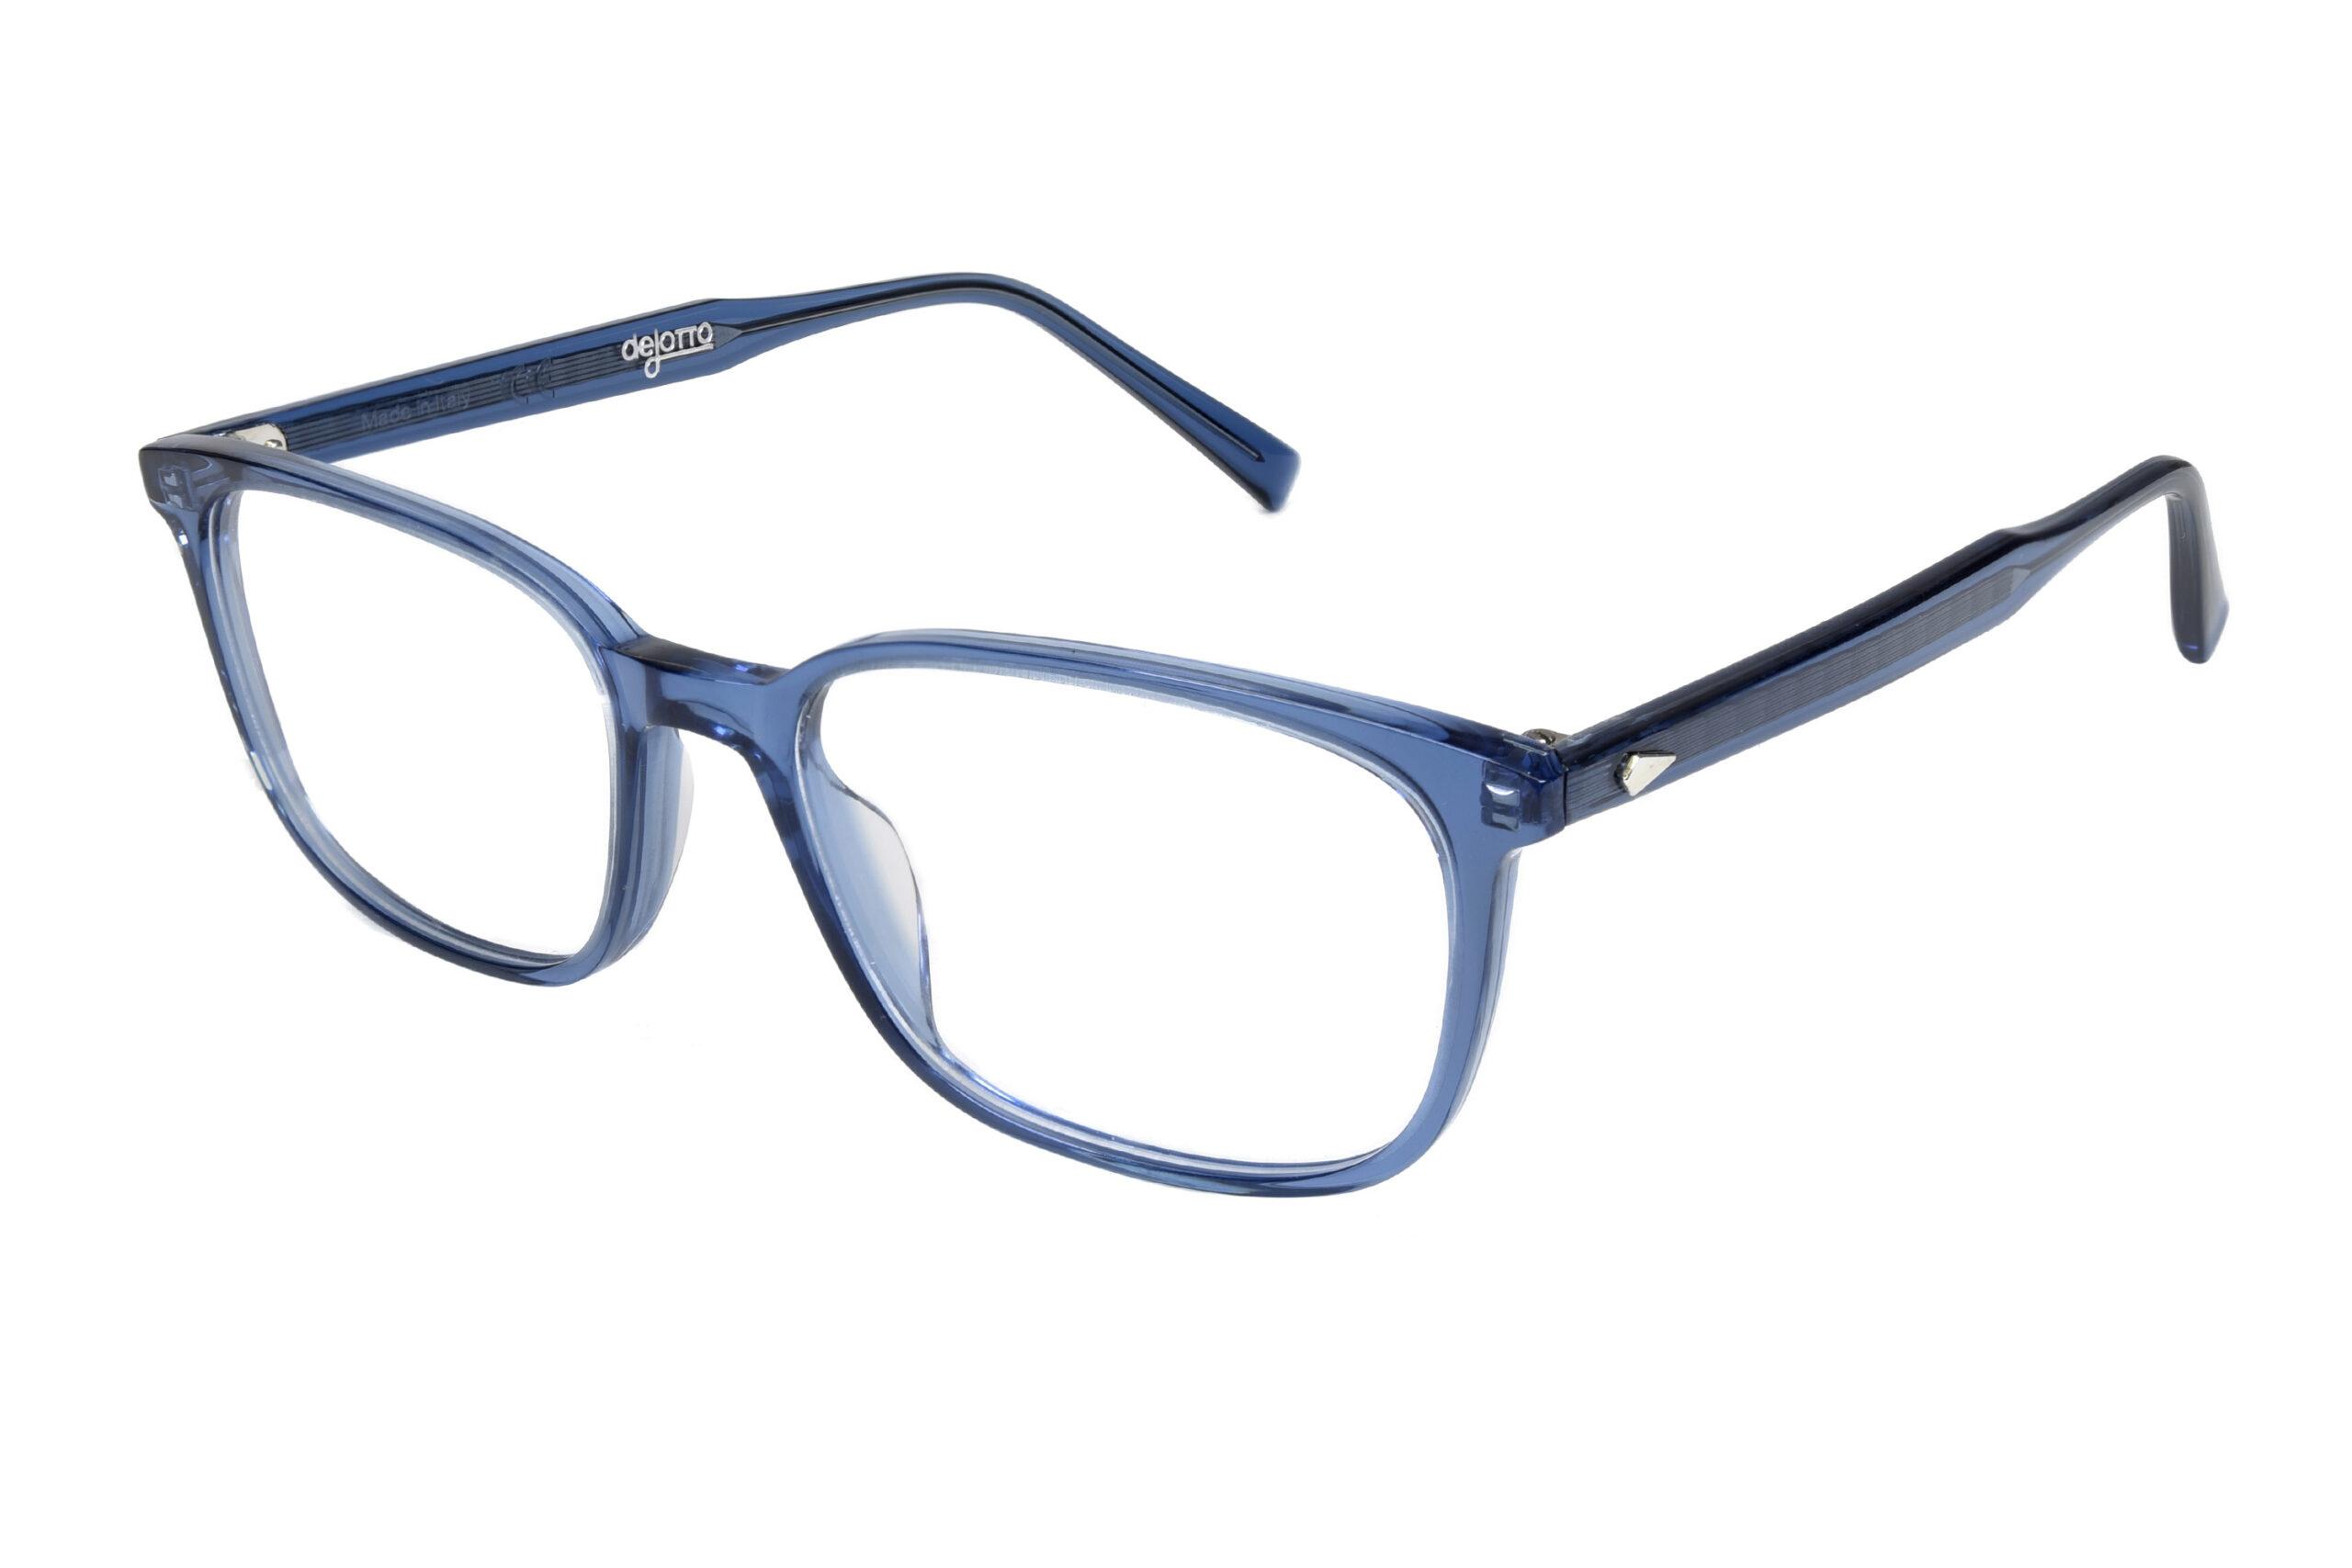 DL 155 c.8018 – Blue